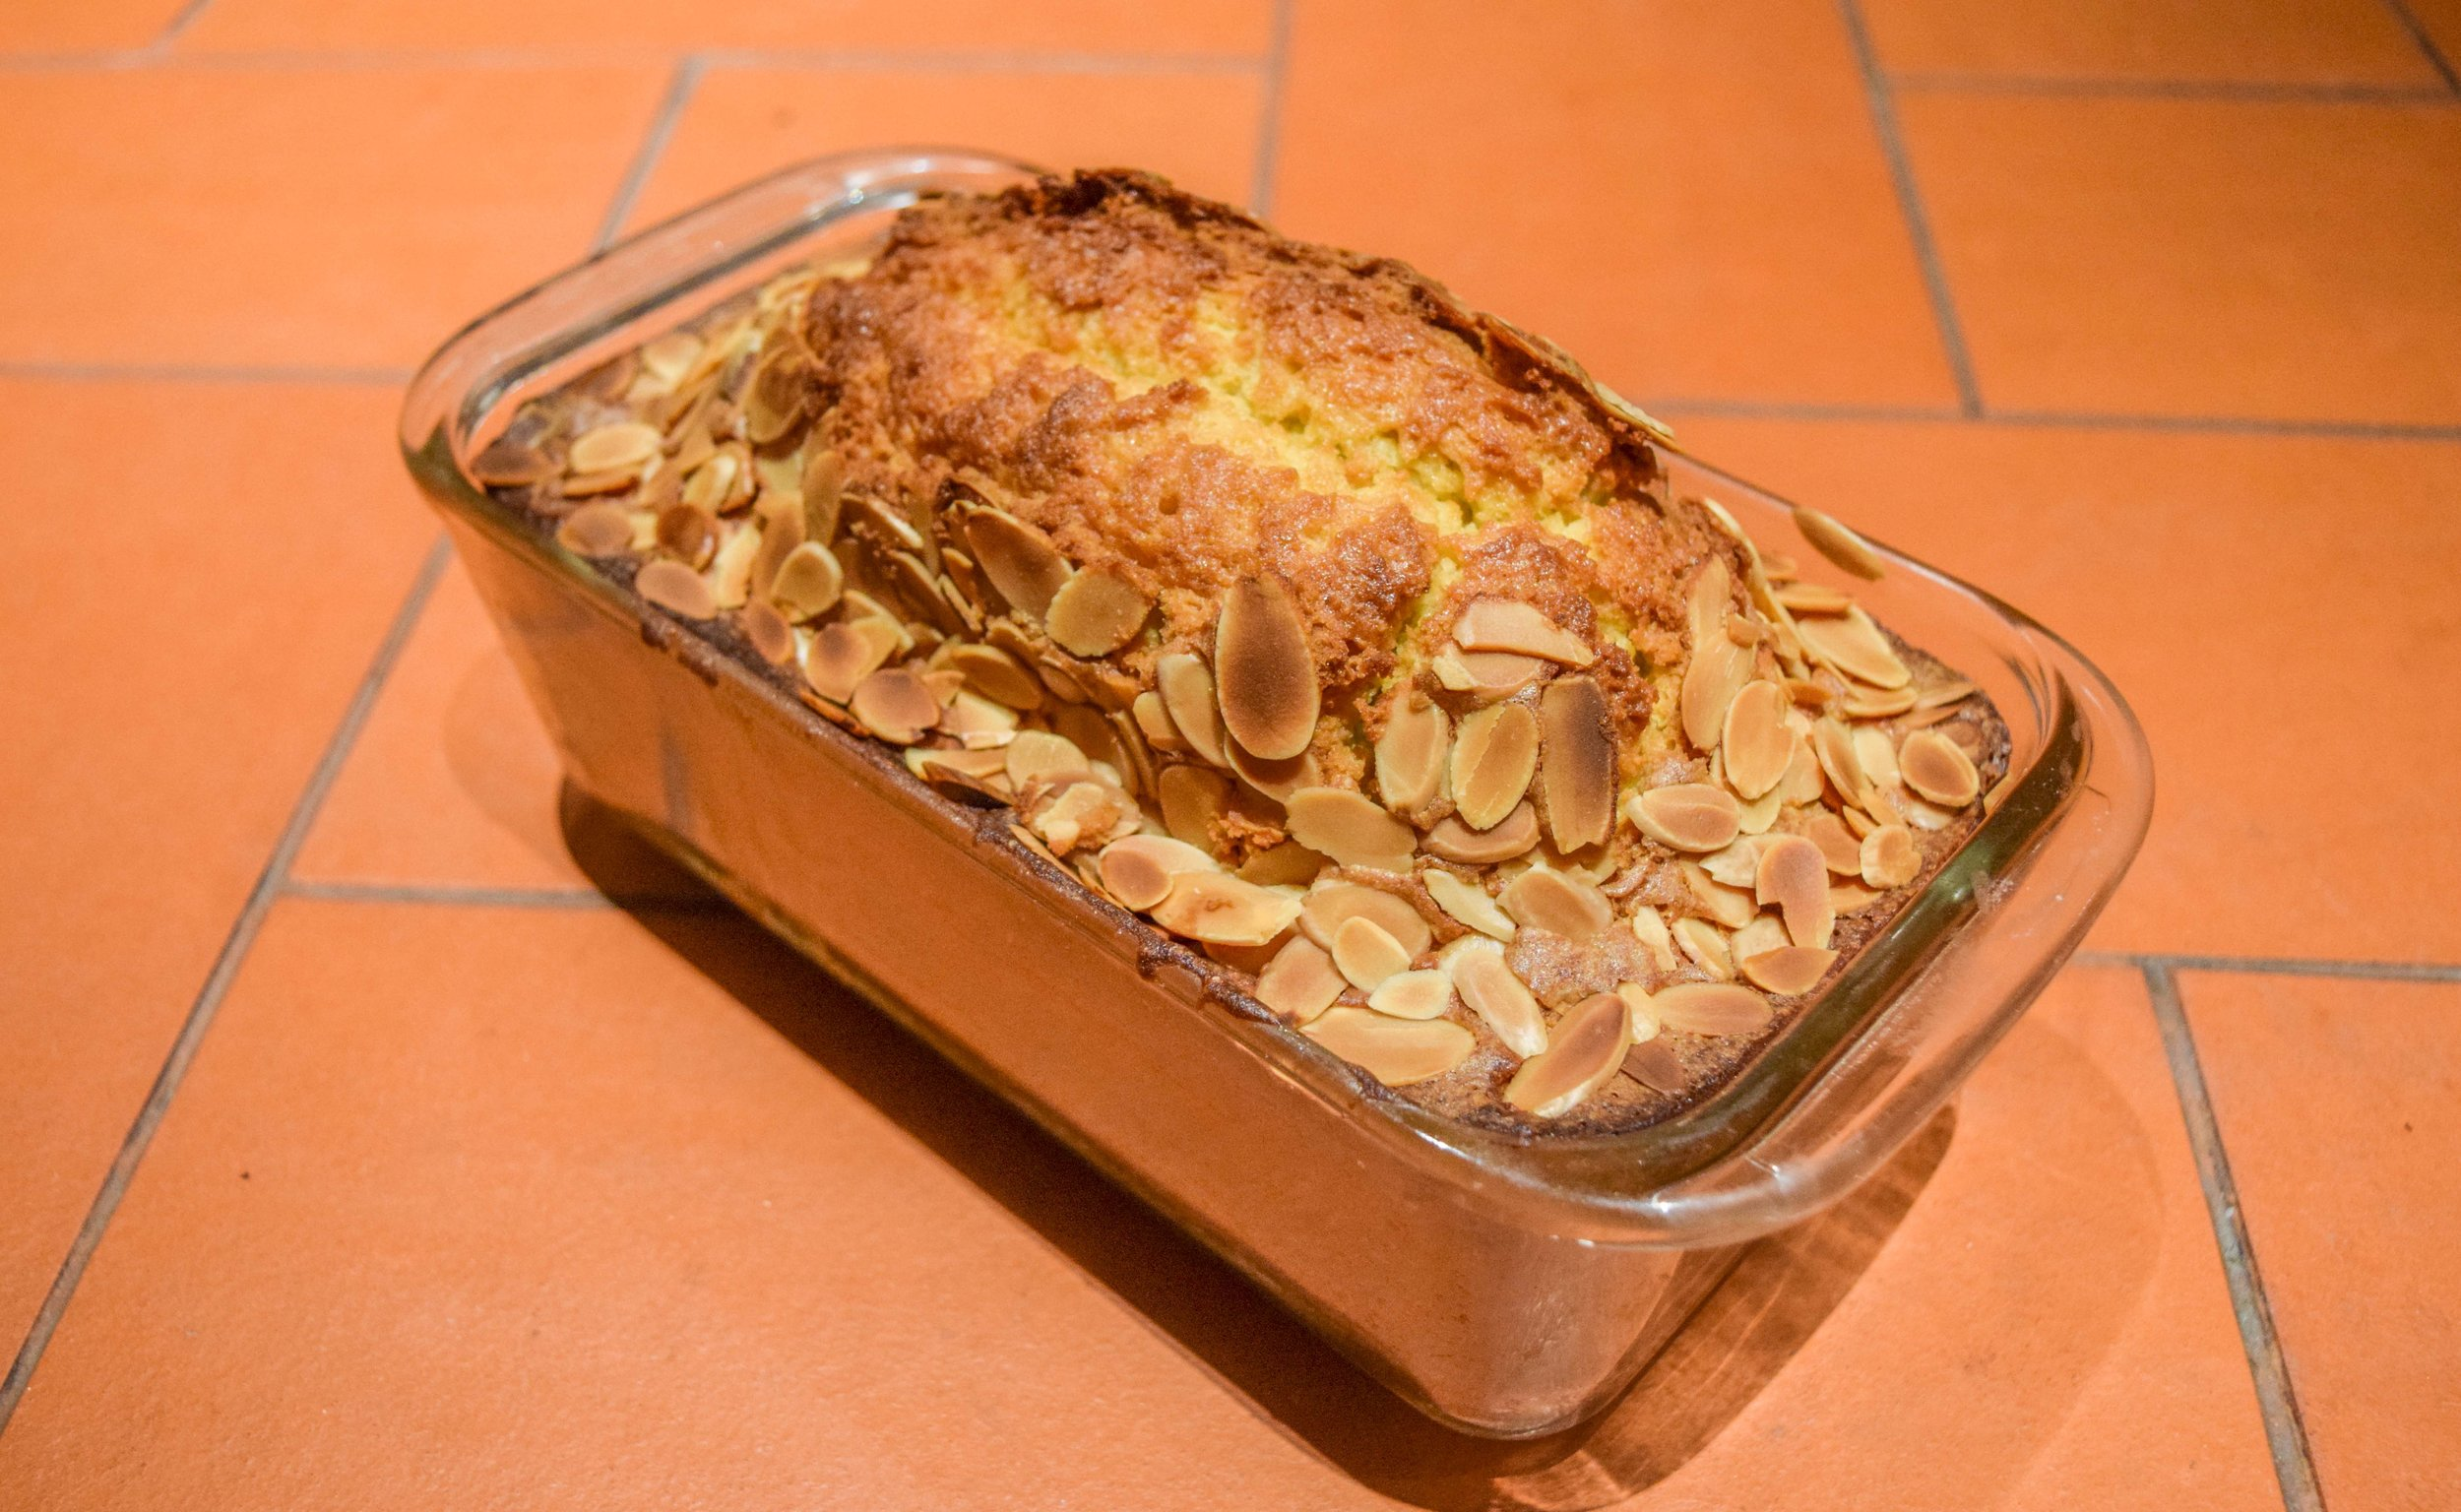 quinta-do-tedo-olive-oil-cake